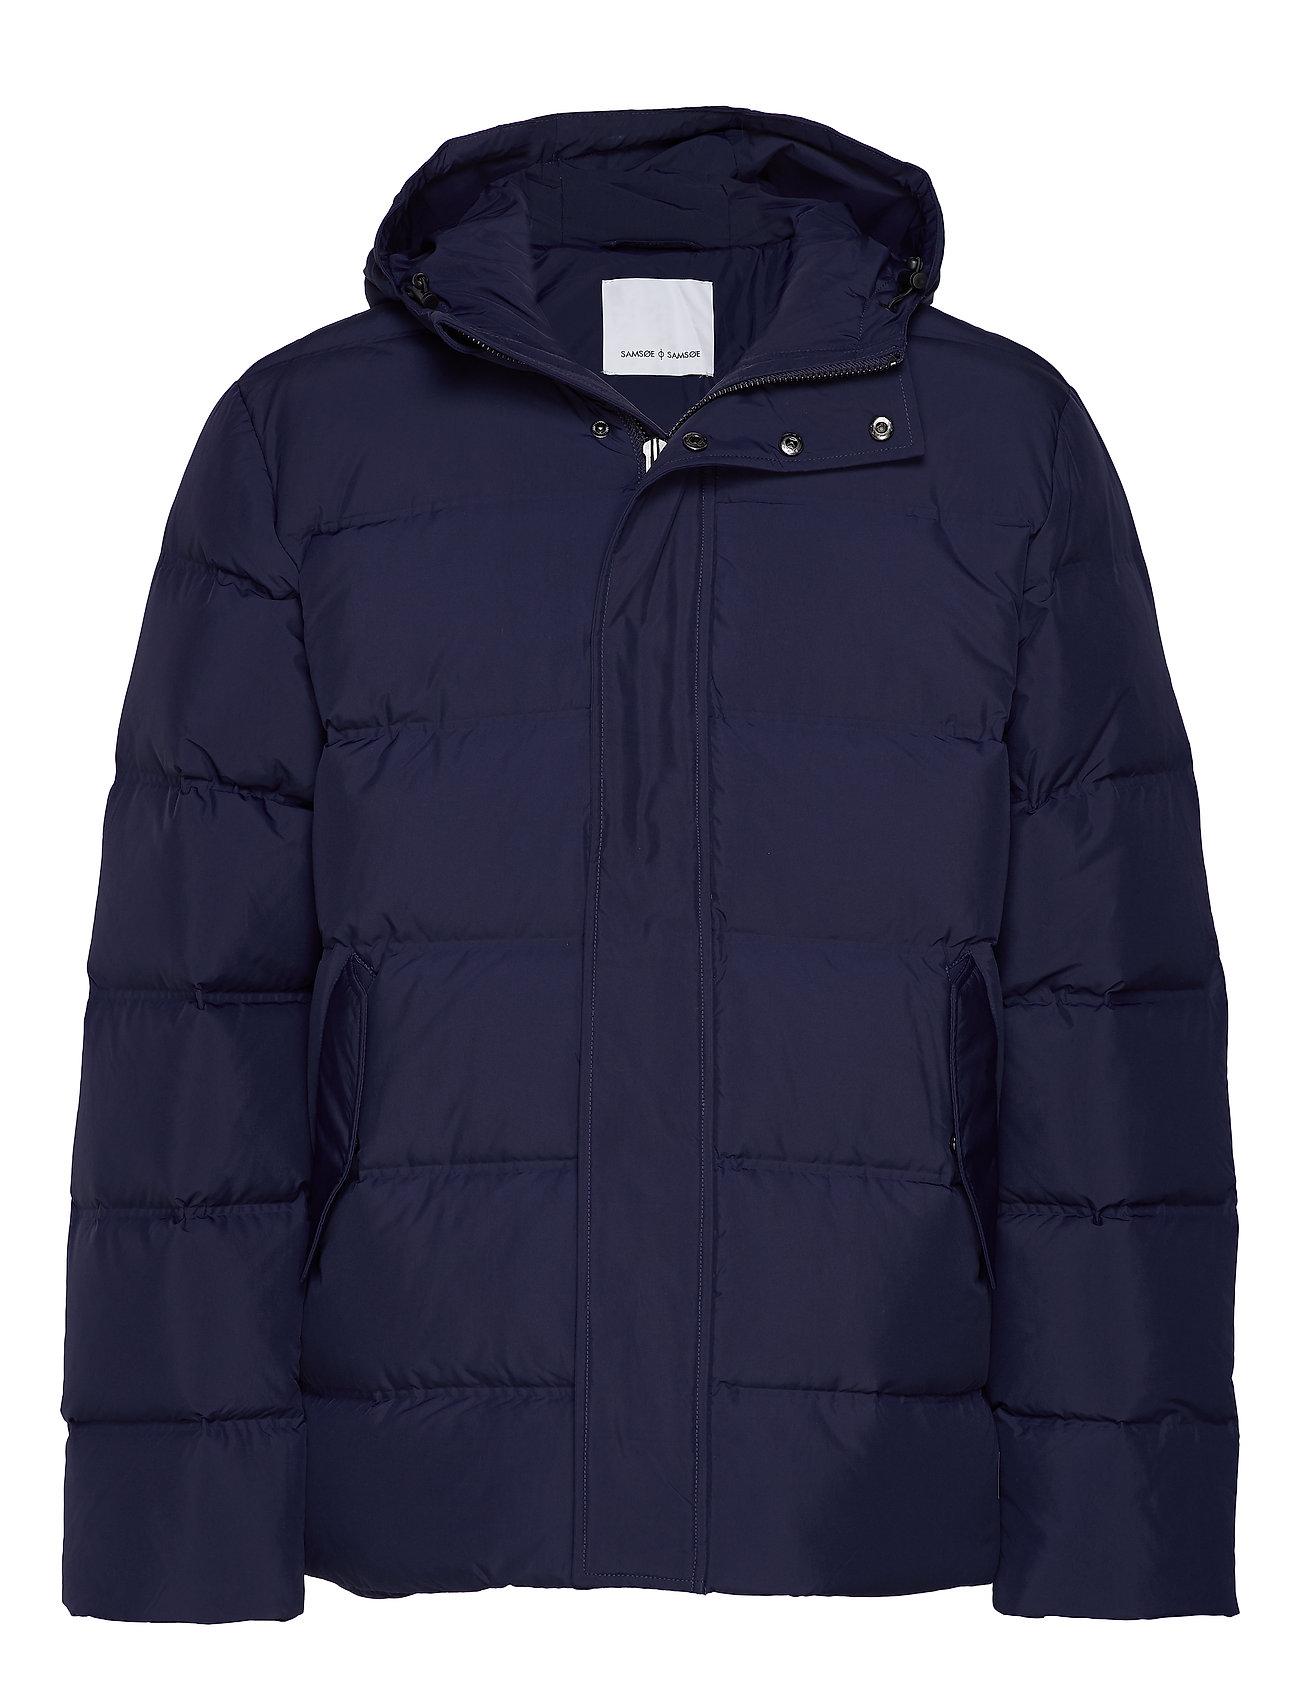 Samsøe & Samsøe Bjarket jacket 8306 - NIGHT SKY